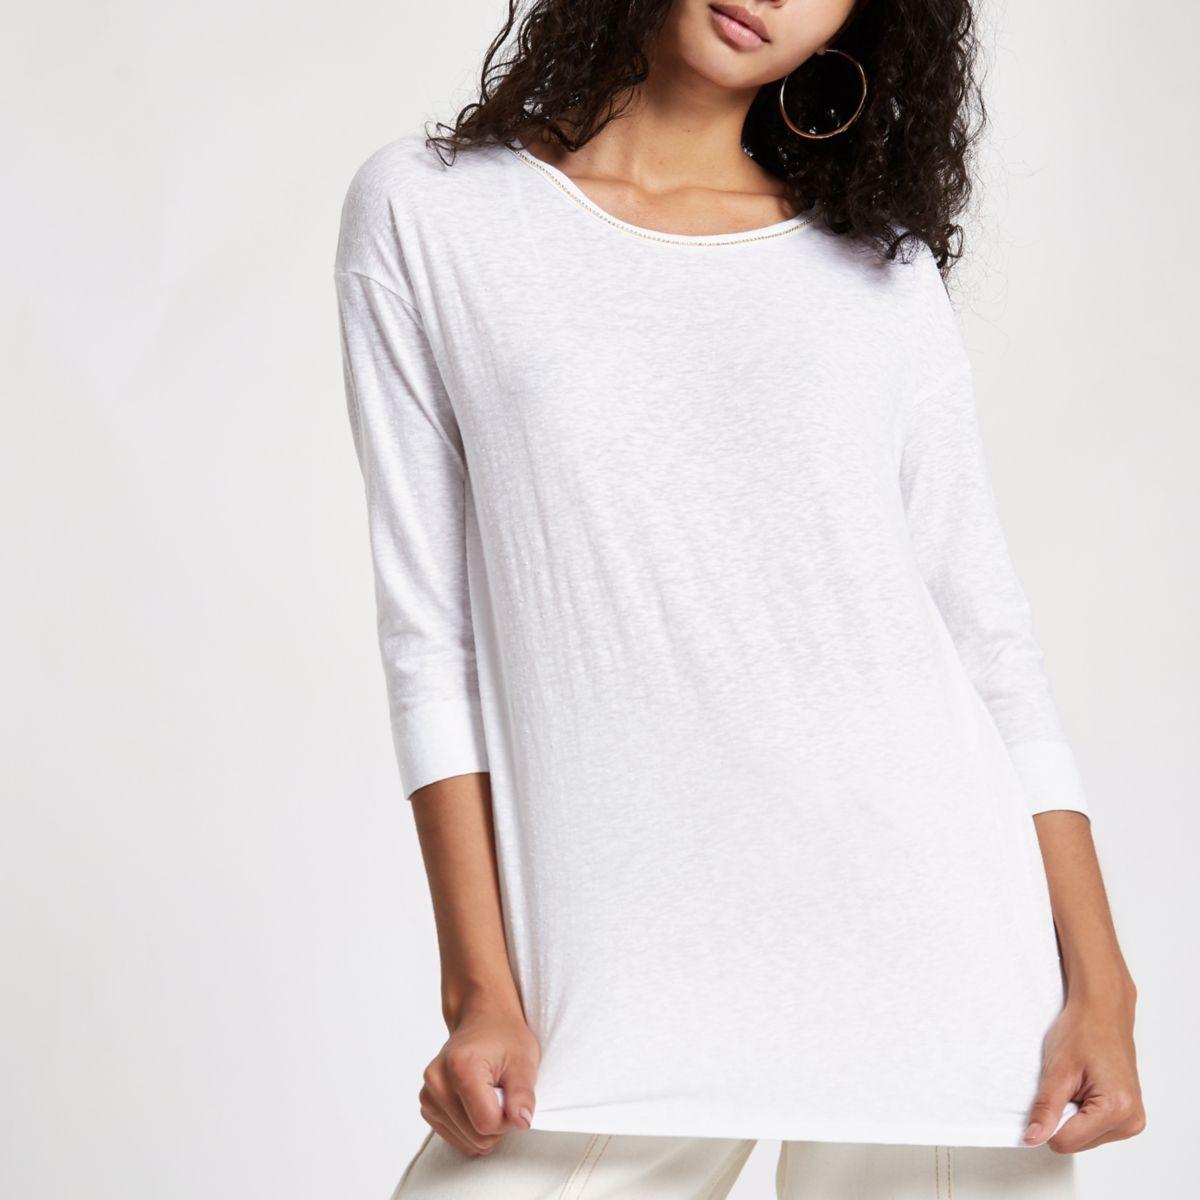 White diamante embellished T-shirt